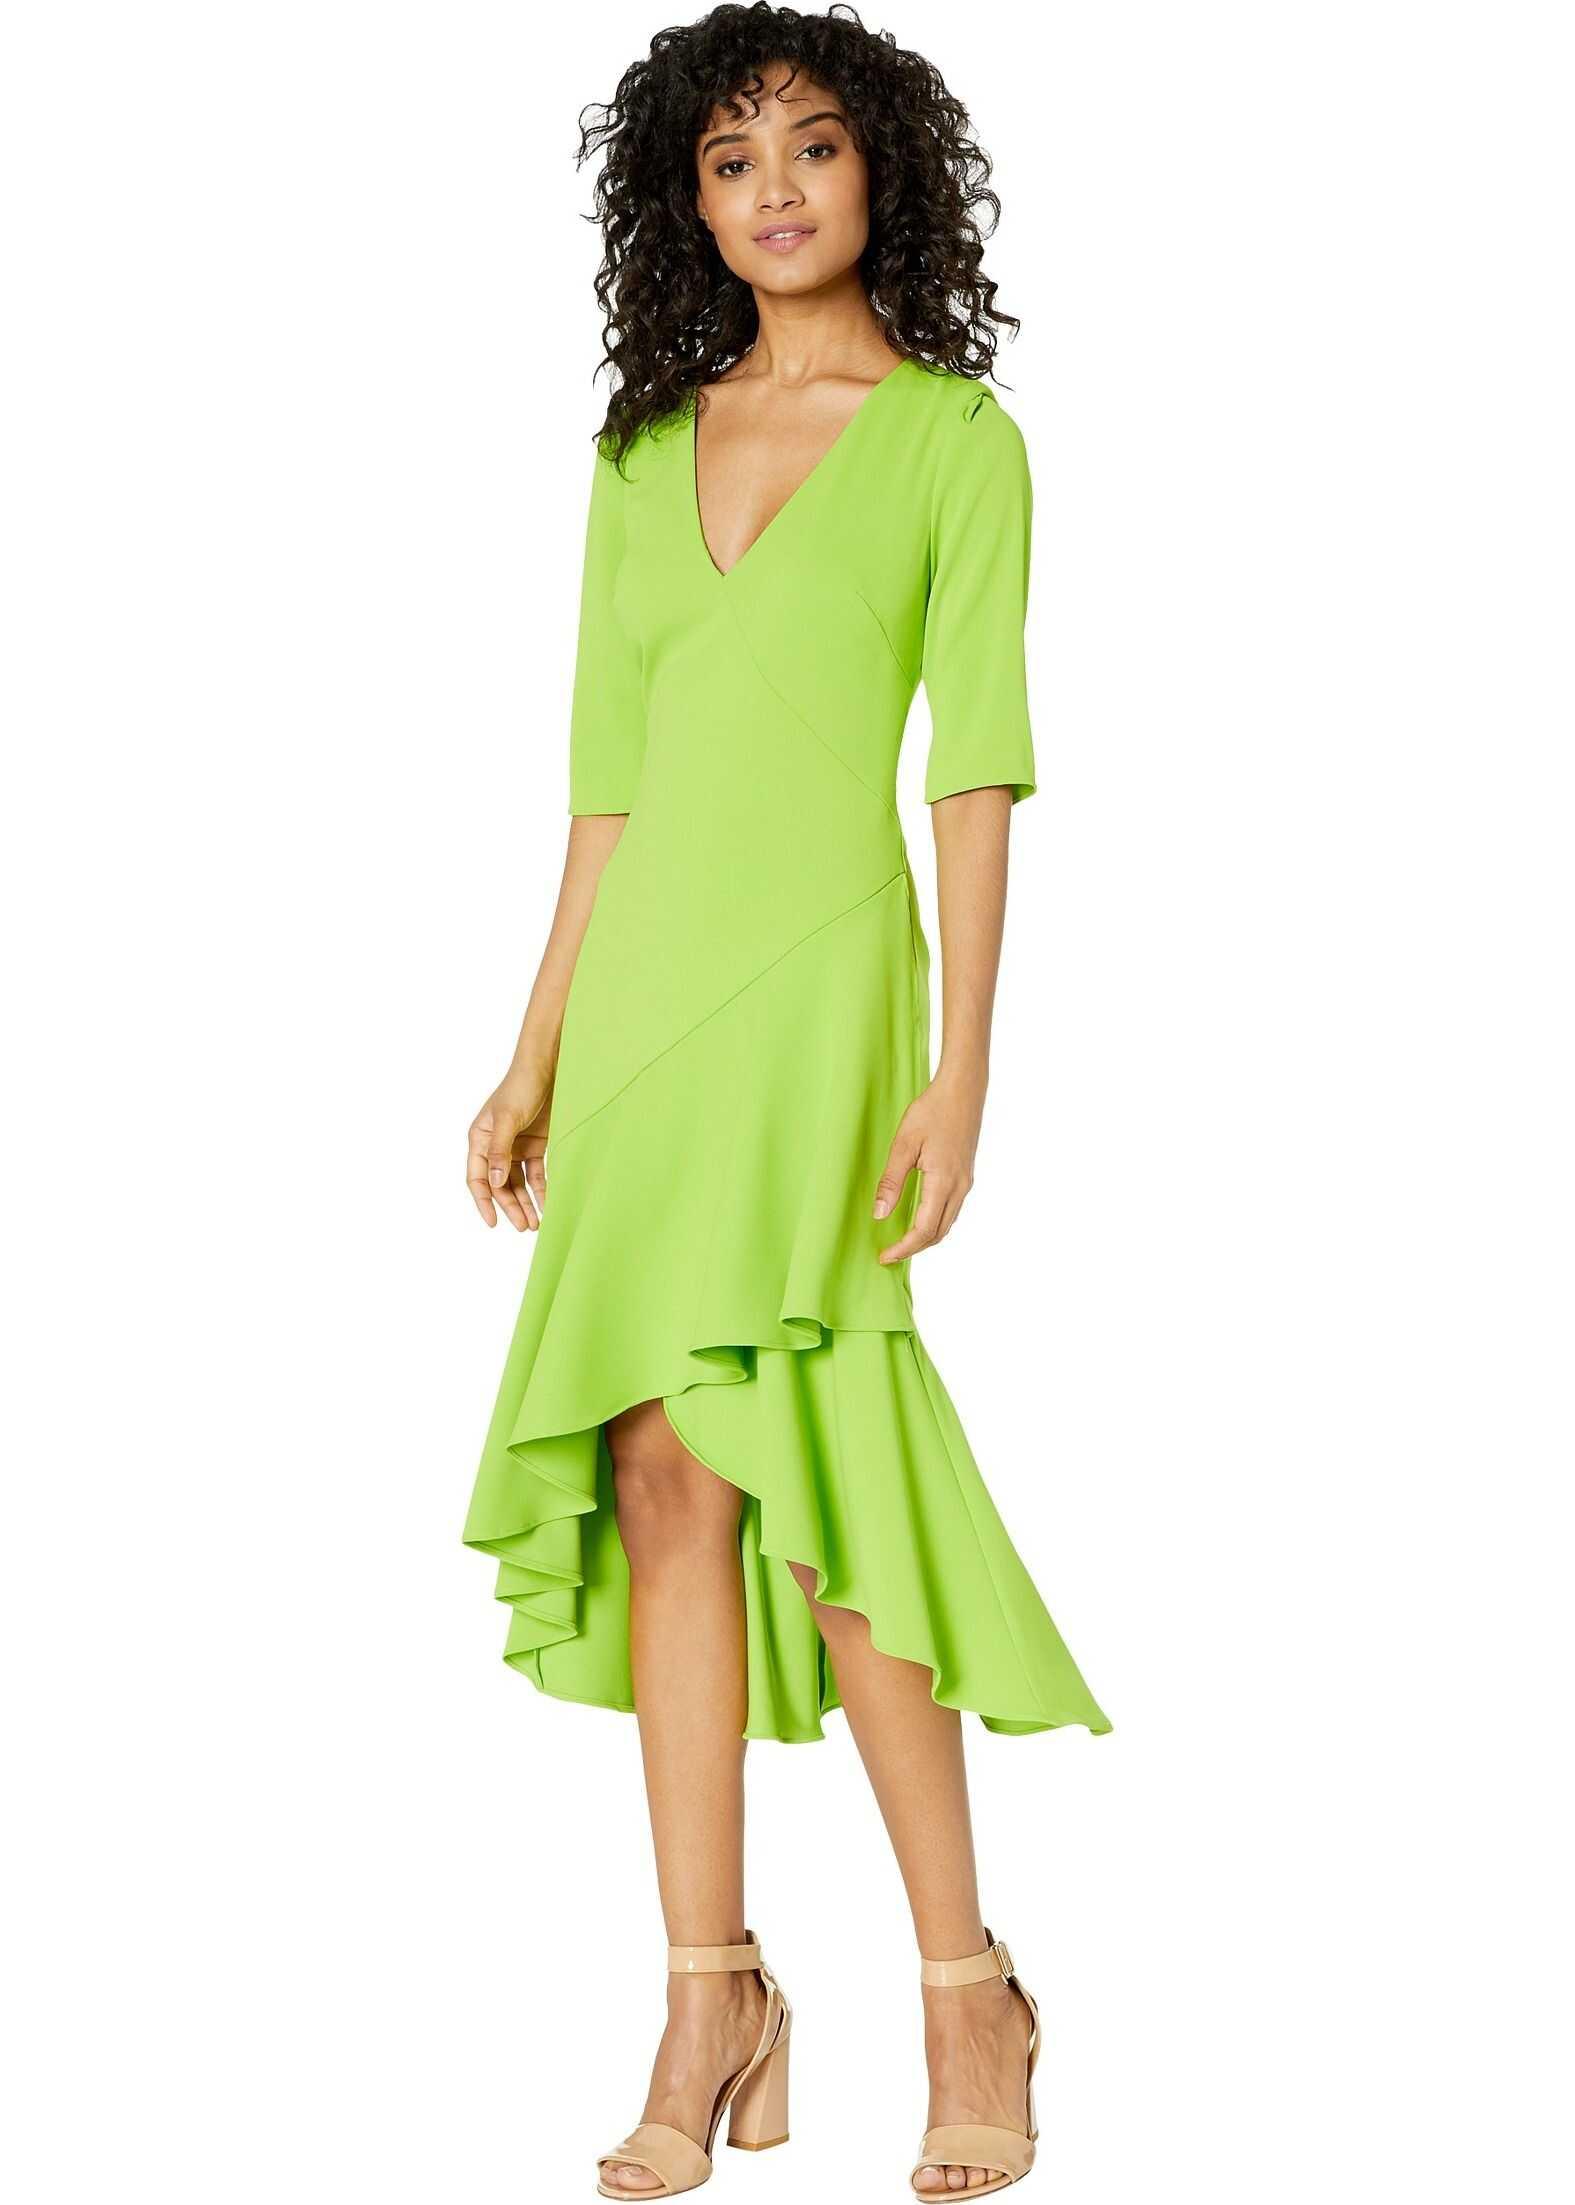 Badgley Mischka Side Ruffle Dress Lime